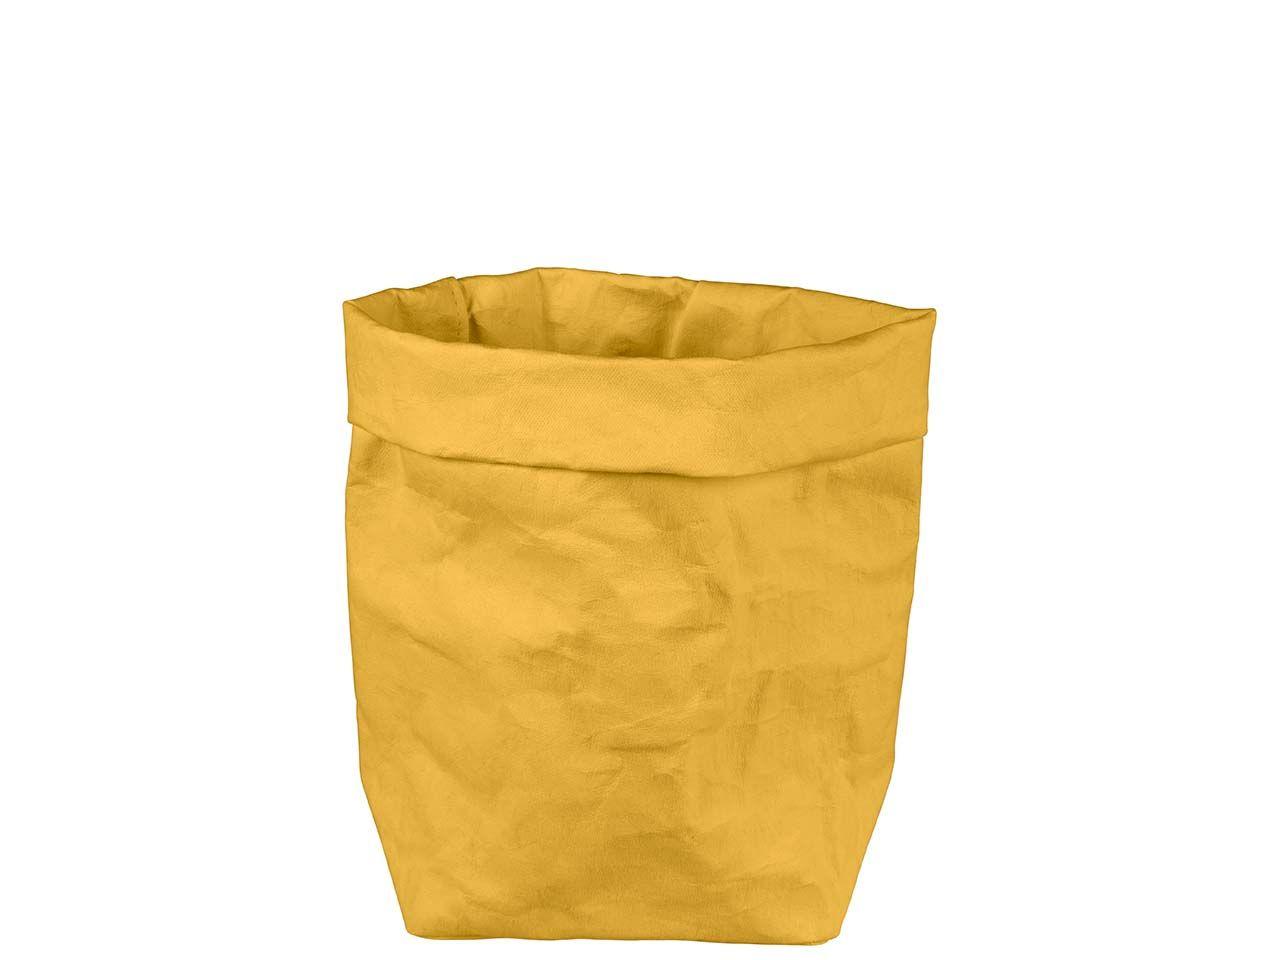 "Krempelbox ""STUFF"" aus Papyr, Gr. L, banana 11427 banana"